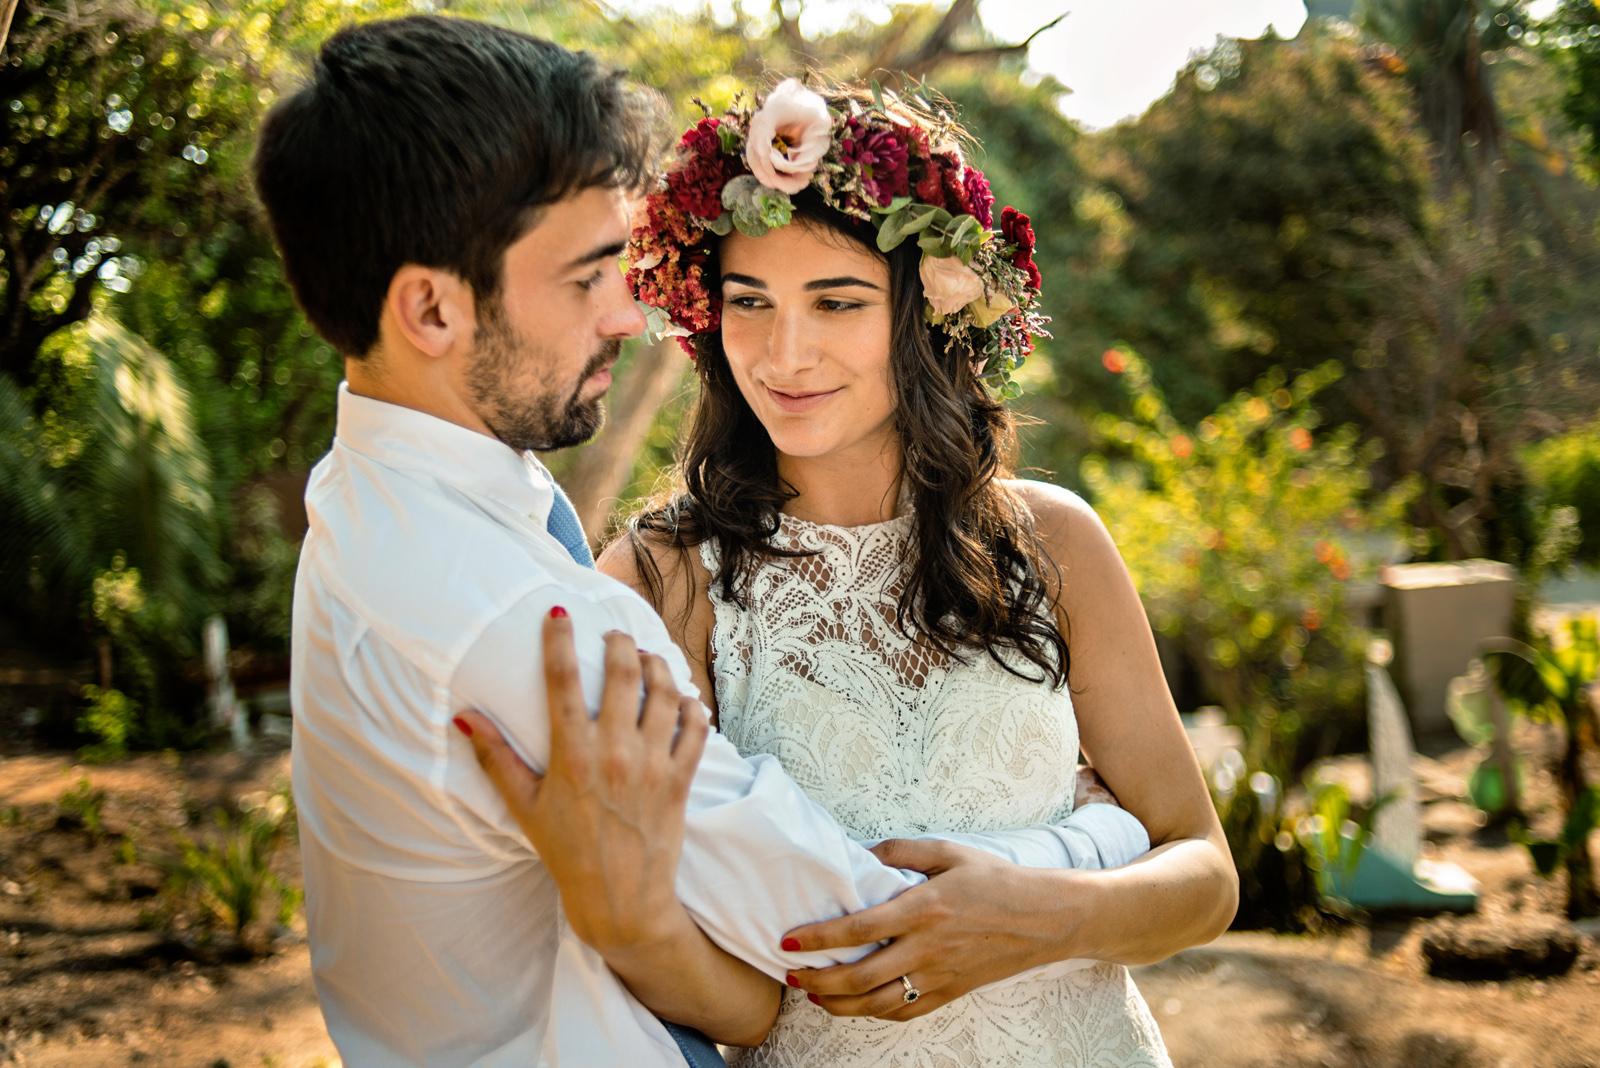 Villa-amor-sayulita-destination-wedding-mexico-051